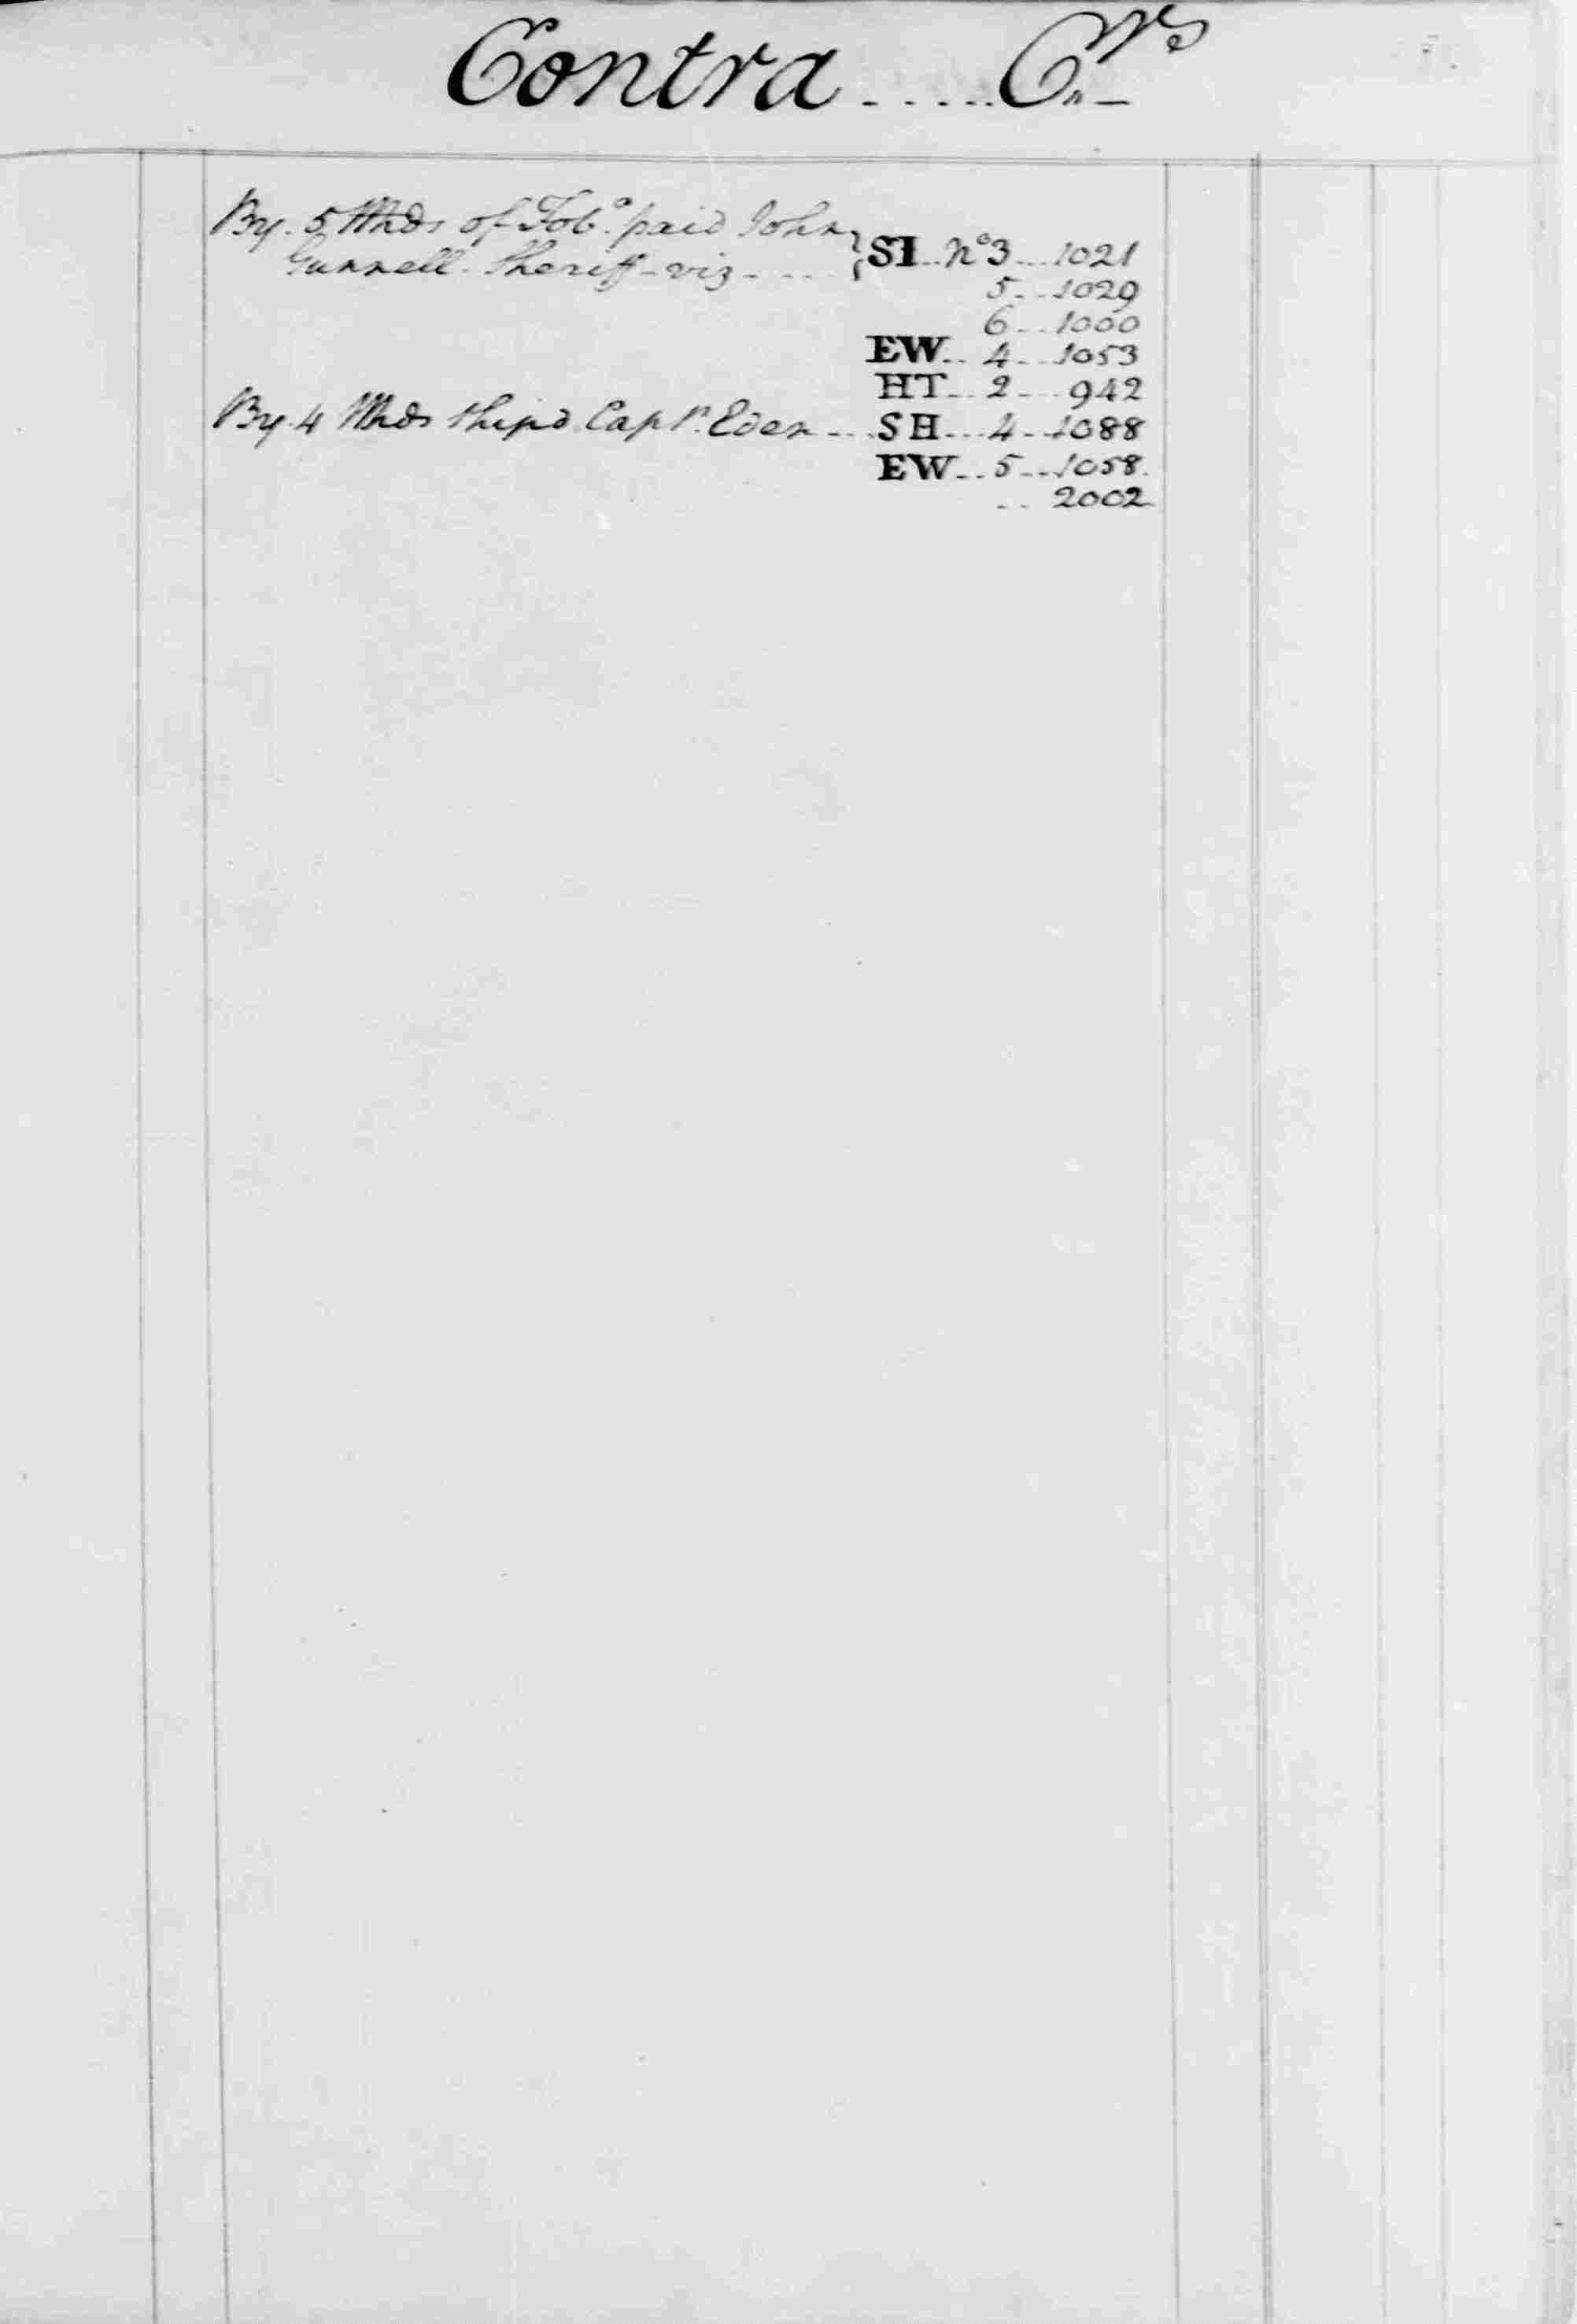 Ledger B, folio 89, right side